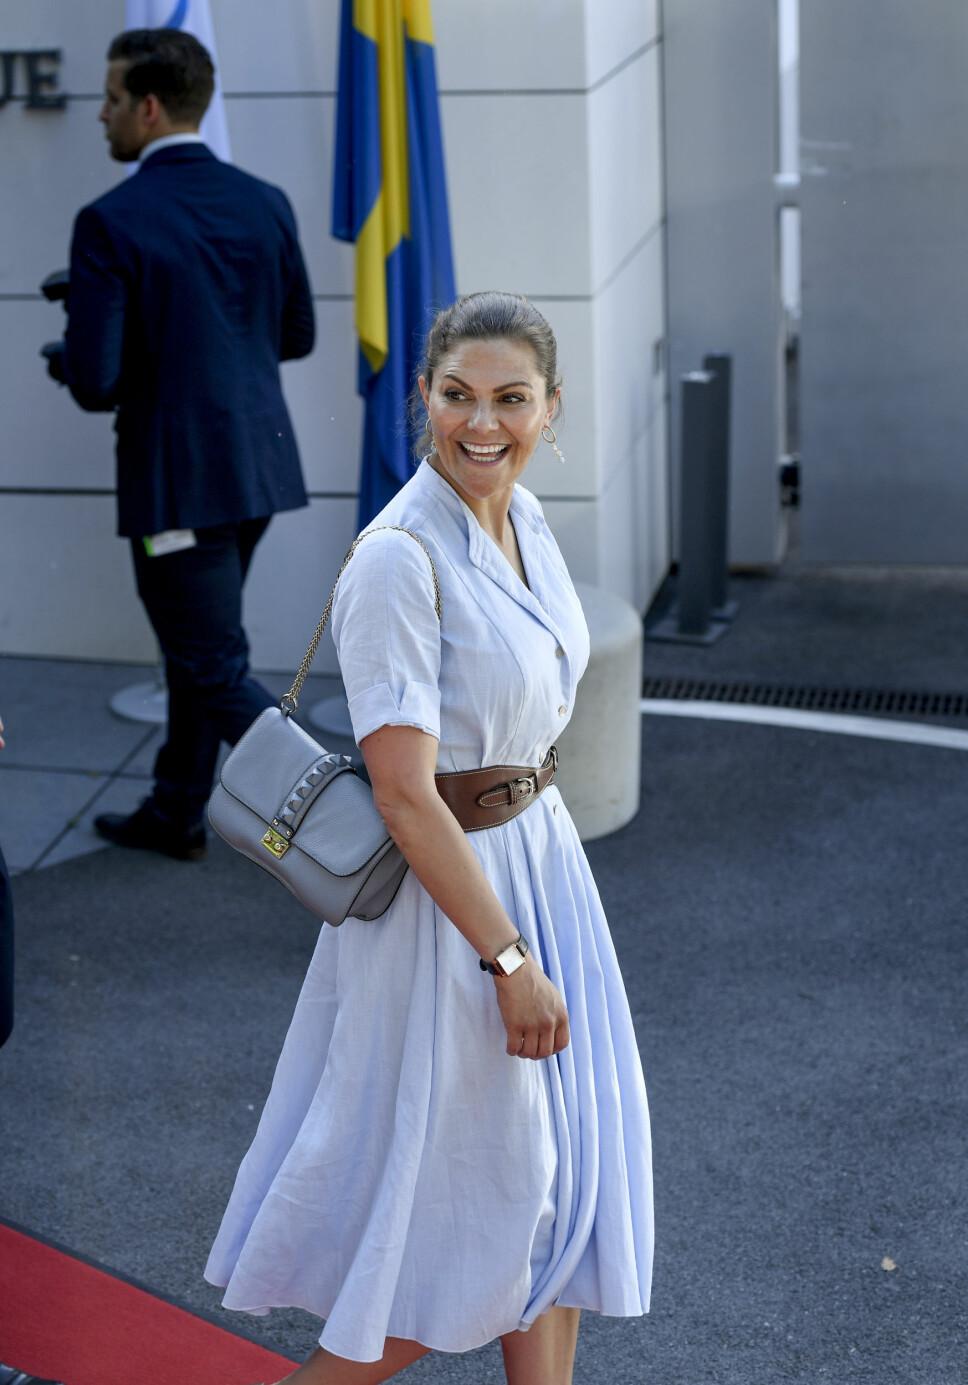 Kronprinsesse Victoria i en lyseblå kjole fra Camilla Thulin.